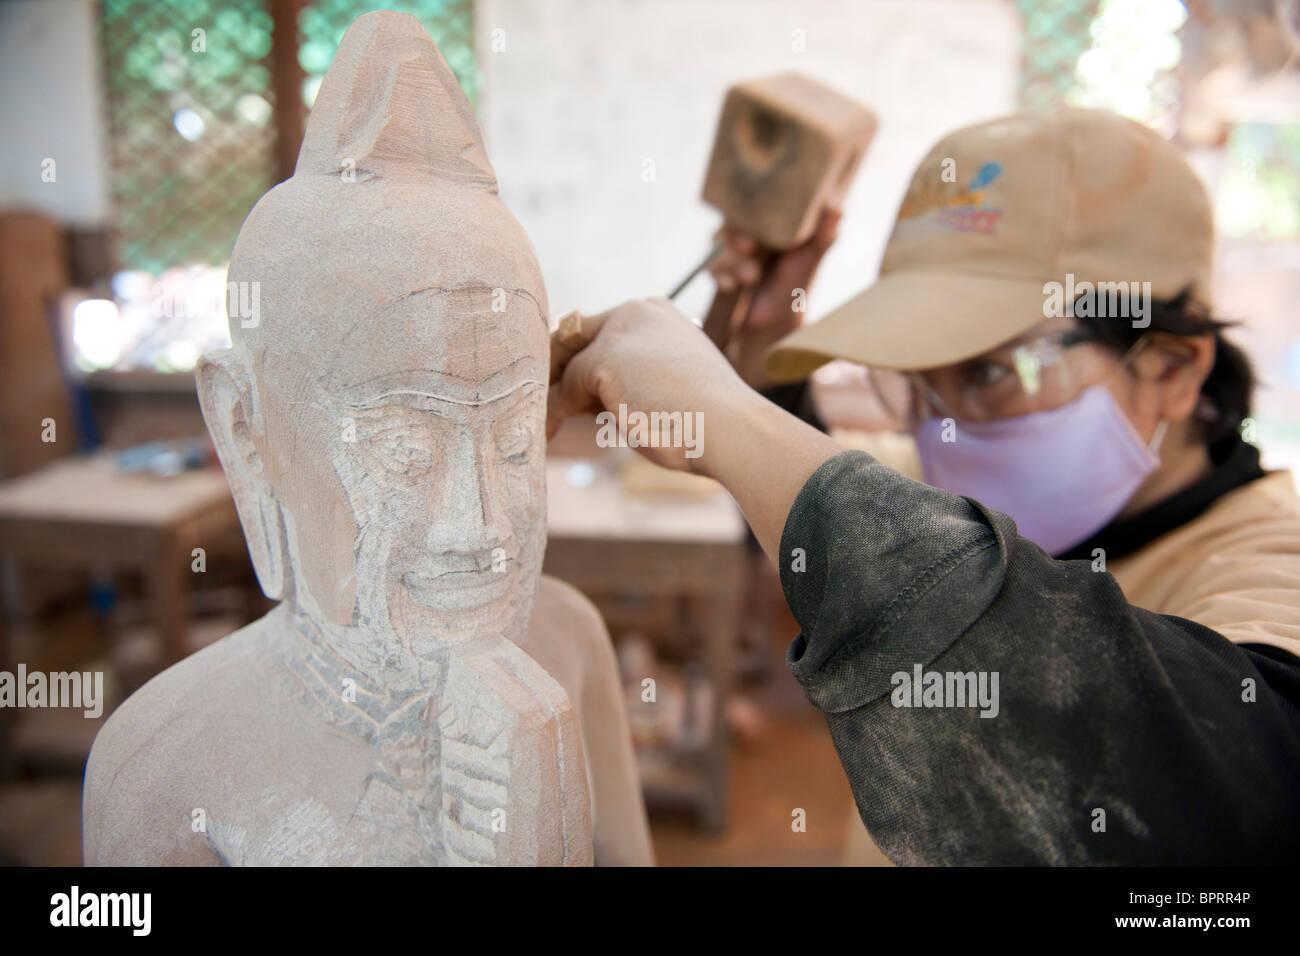 Sculptor at work at Artisans d'Angkor, Siem Reap, Cambodia - Stock Image